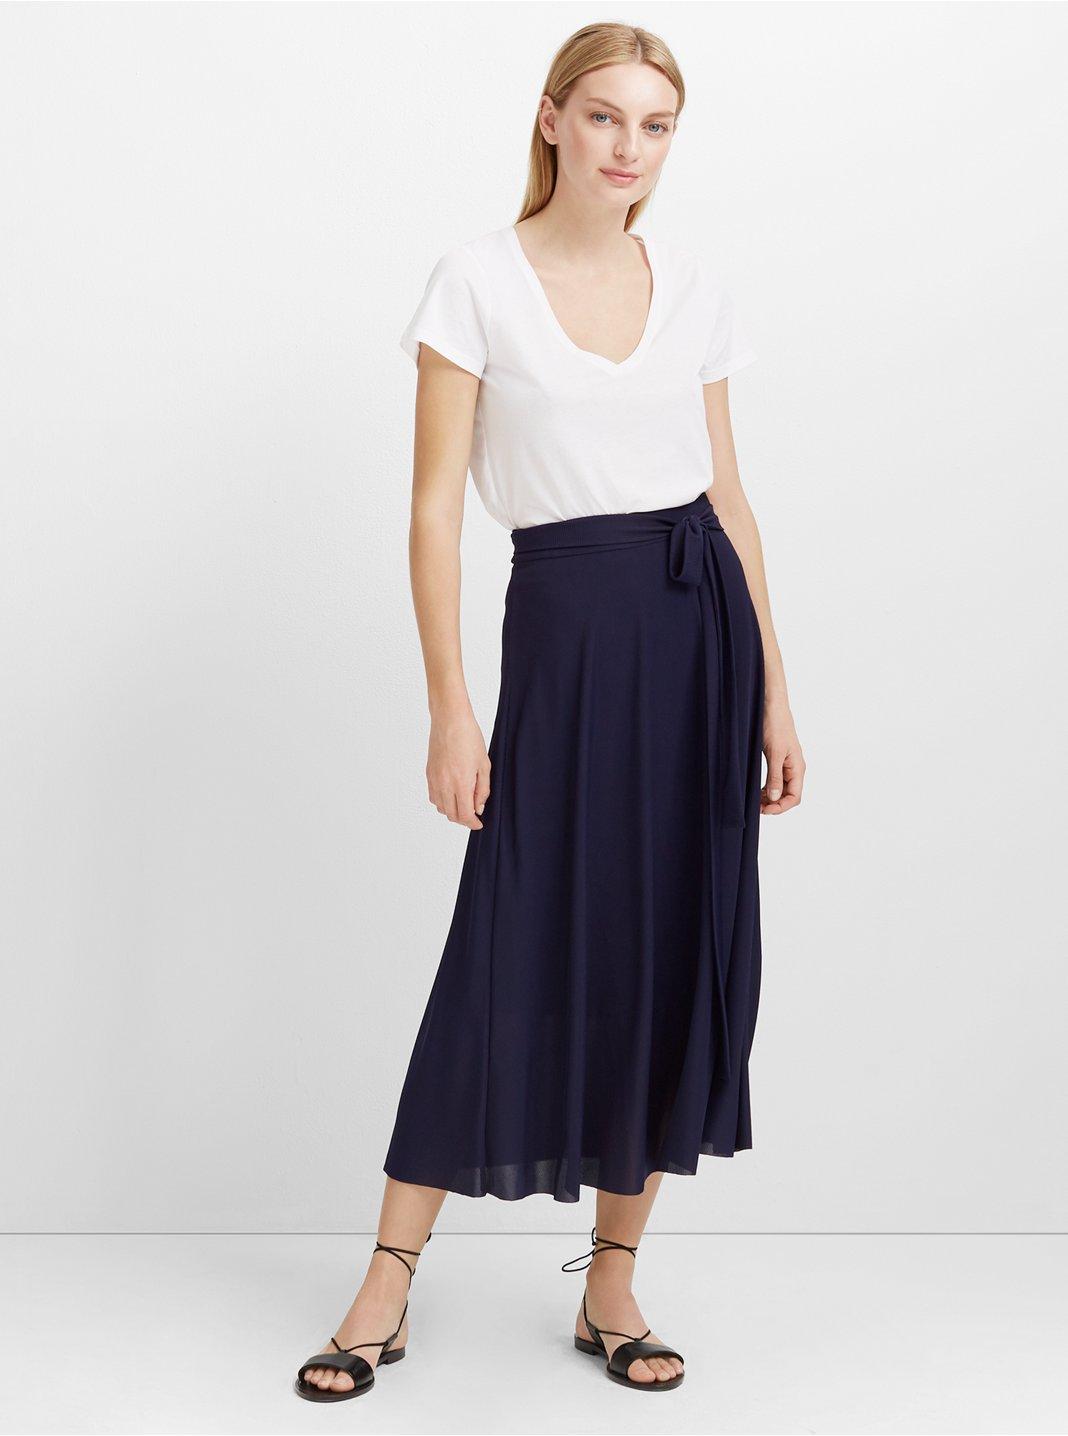 Nataliyah Skirt